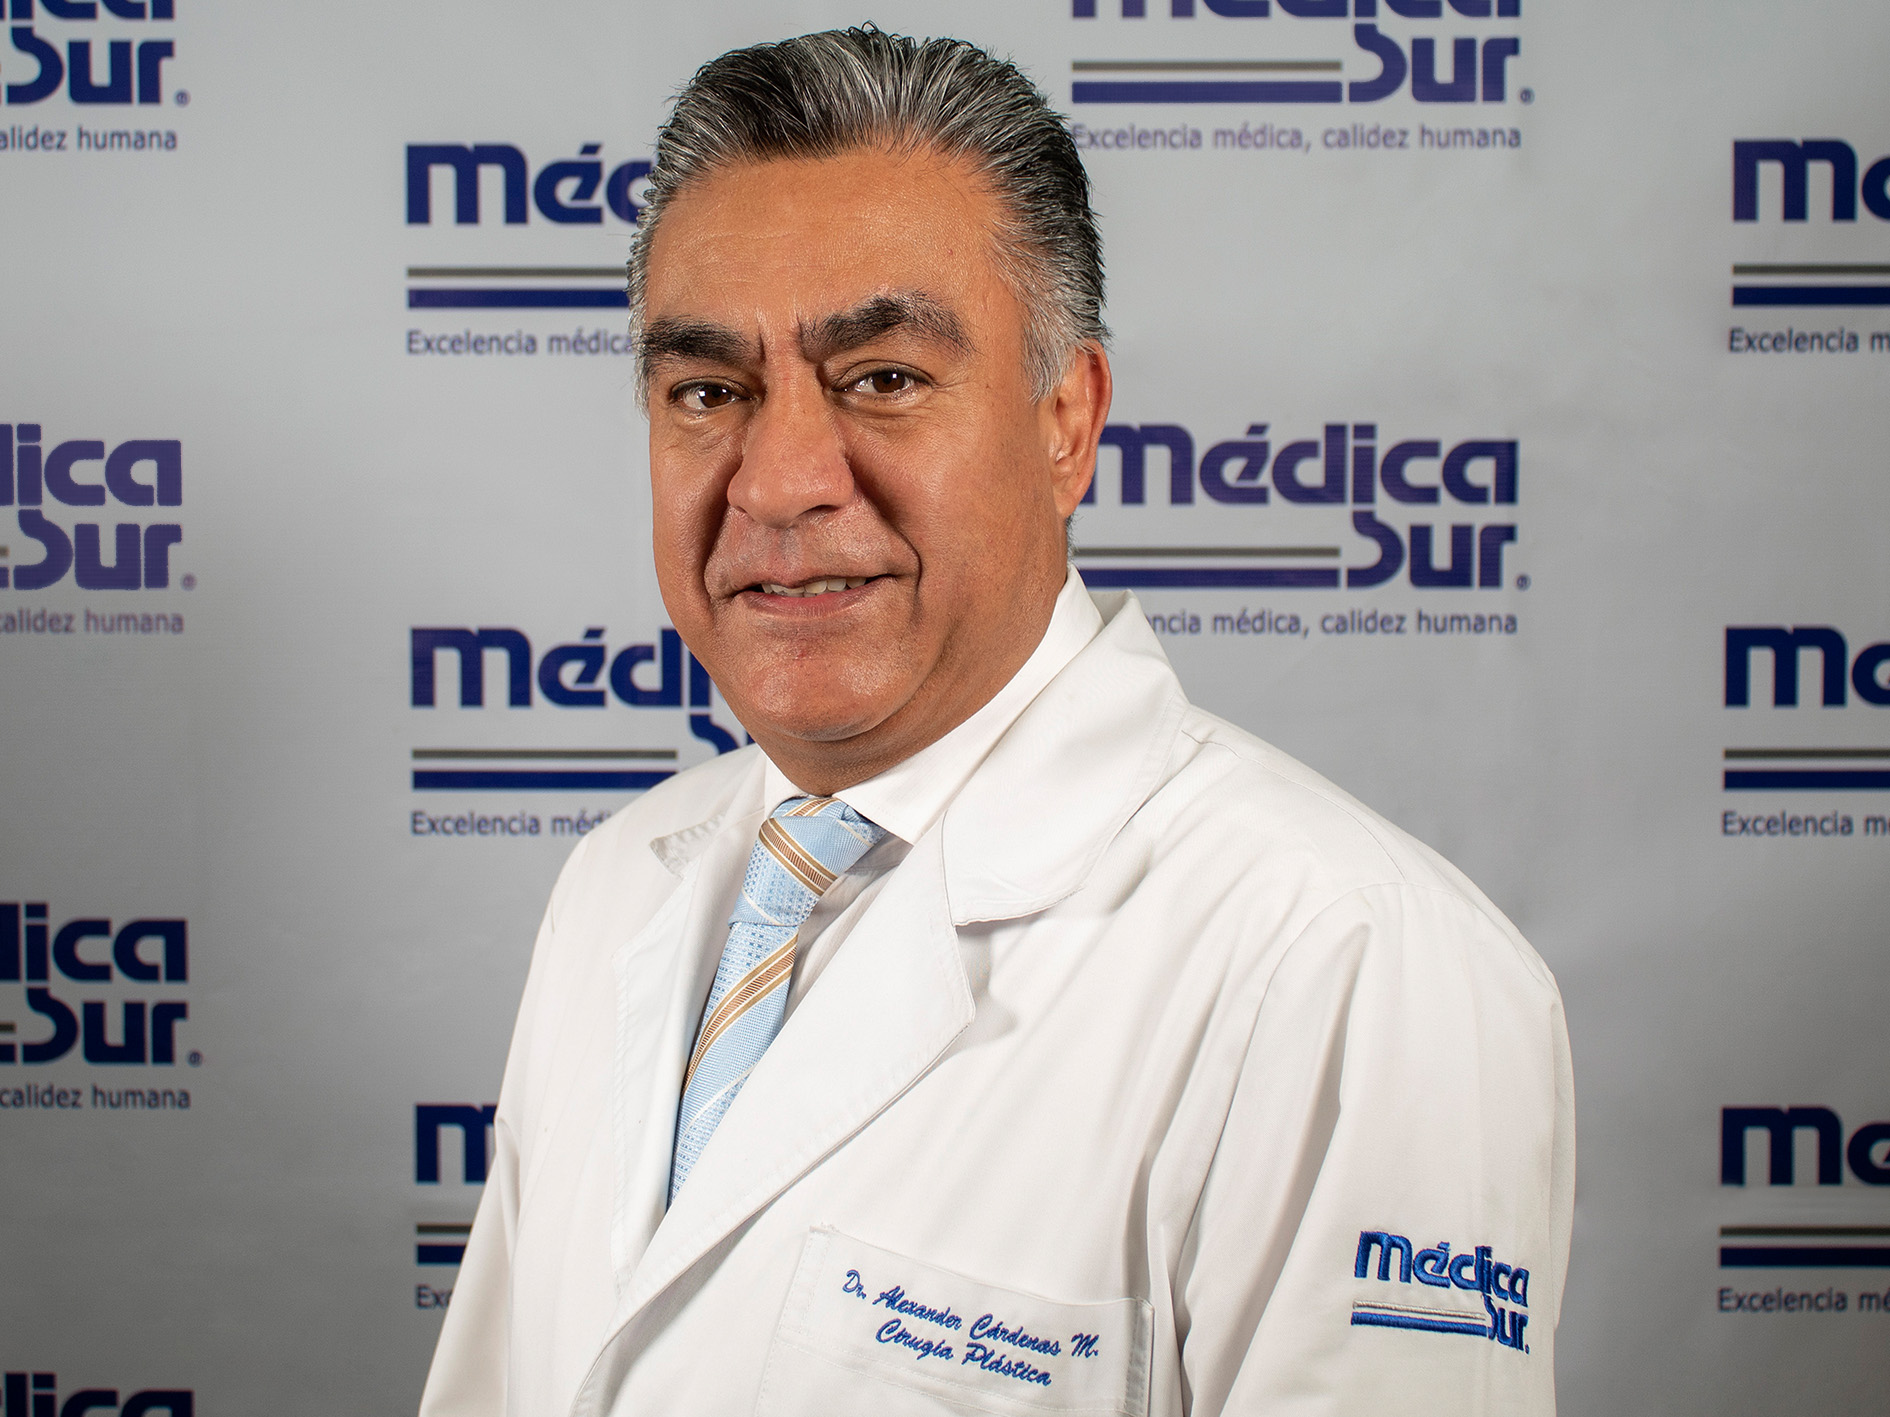 DR. Alexander Cárdenas Mejía